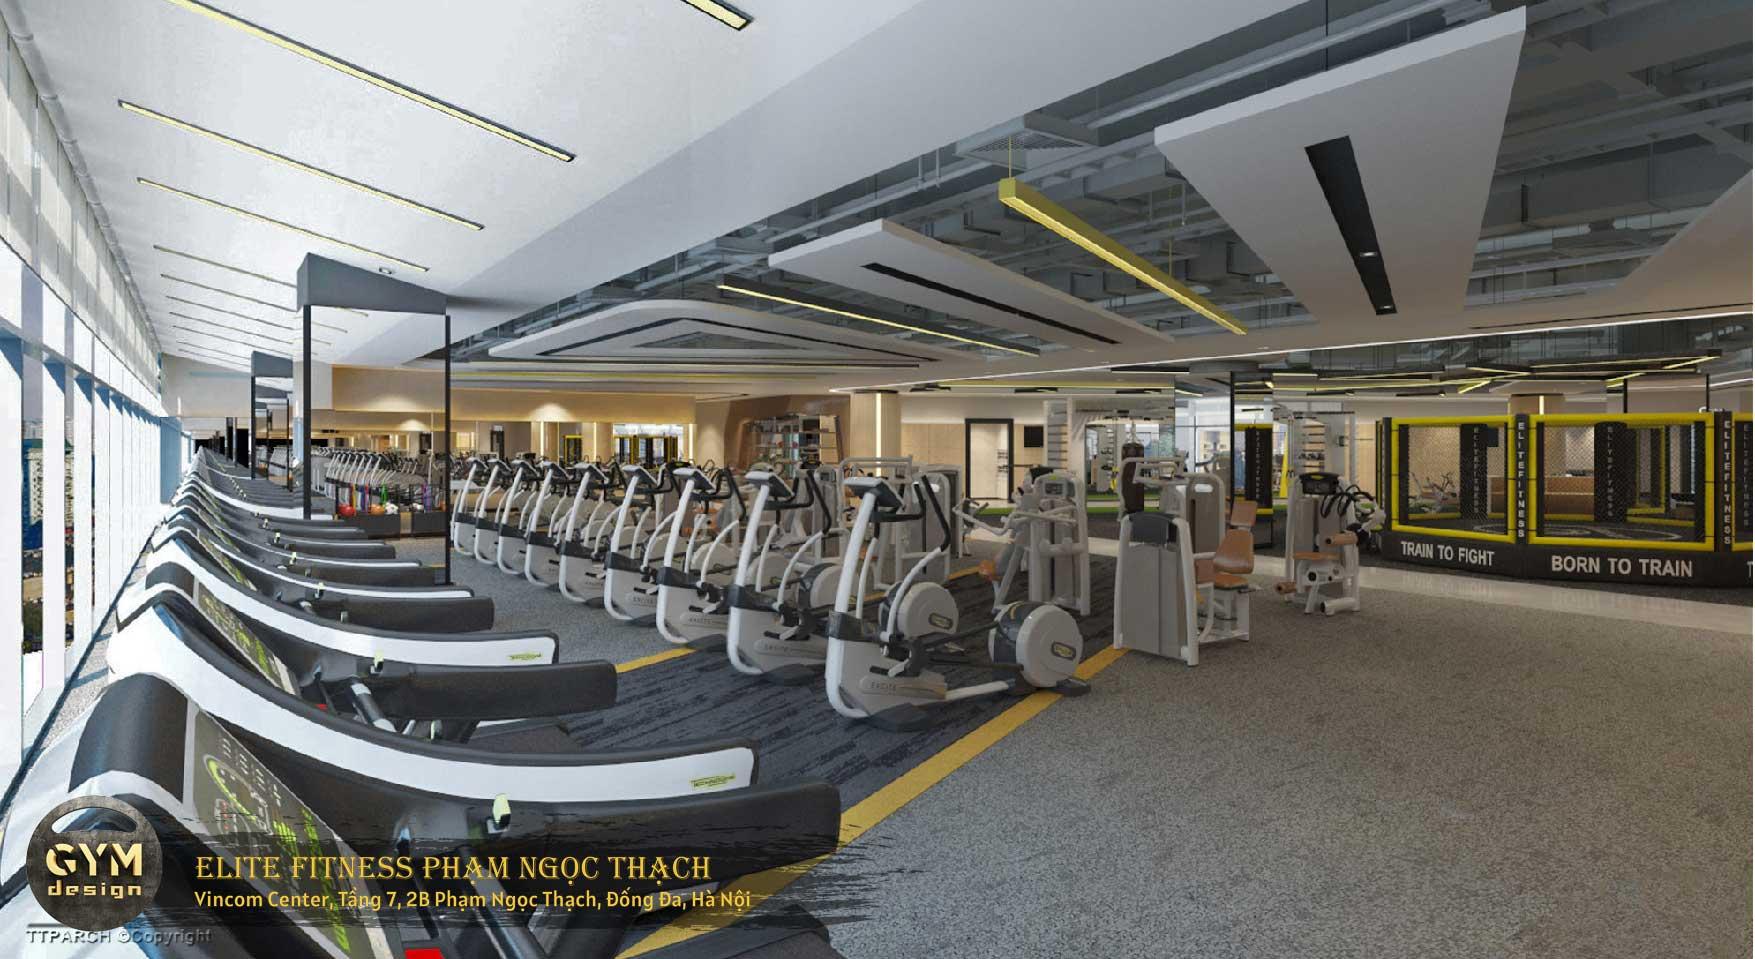 du-an-elite-fitness-pham-ngoc-thach-64